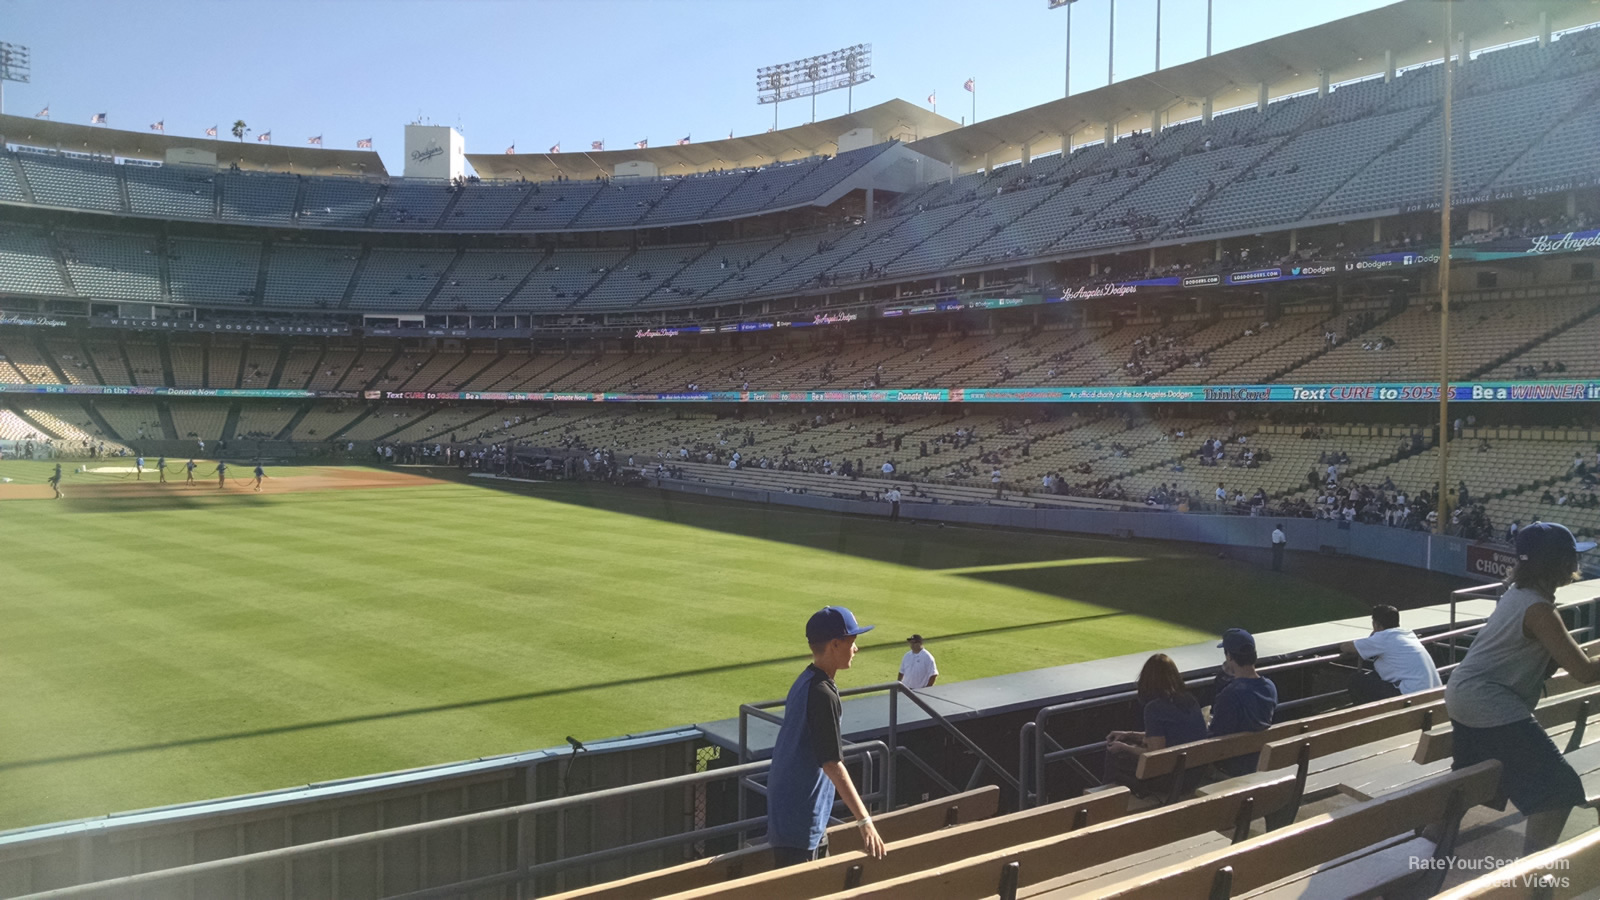 Dodger Stadium Section 307 - RateYourSeats.com